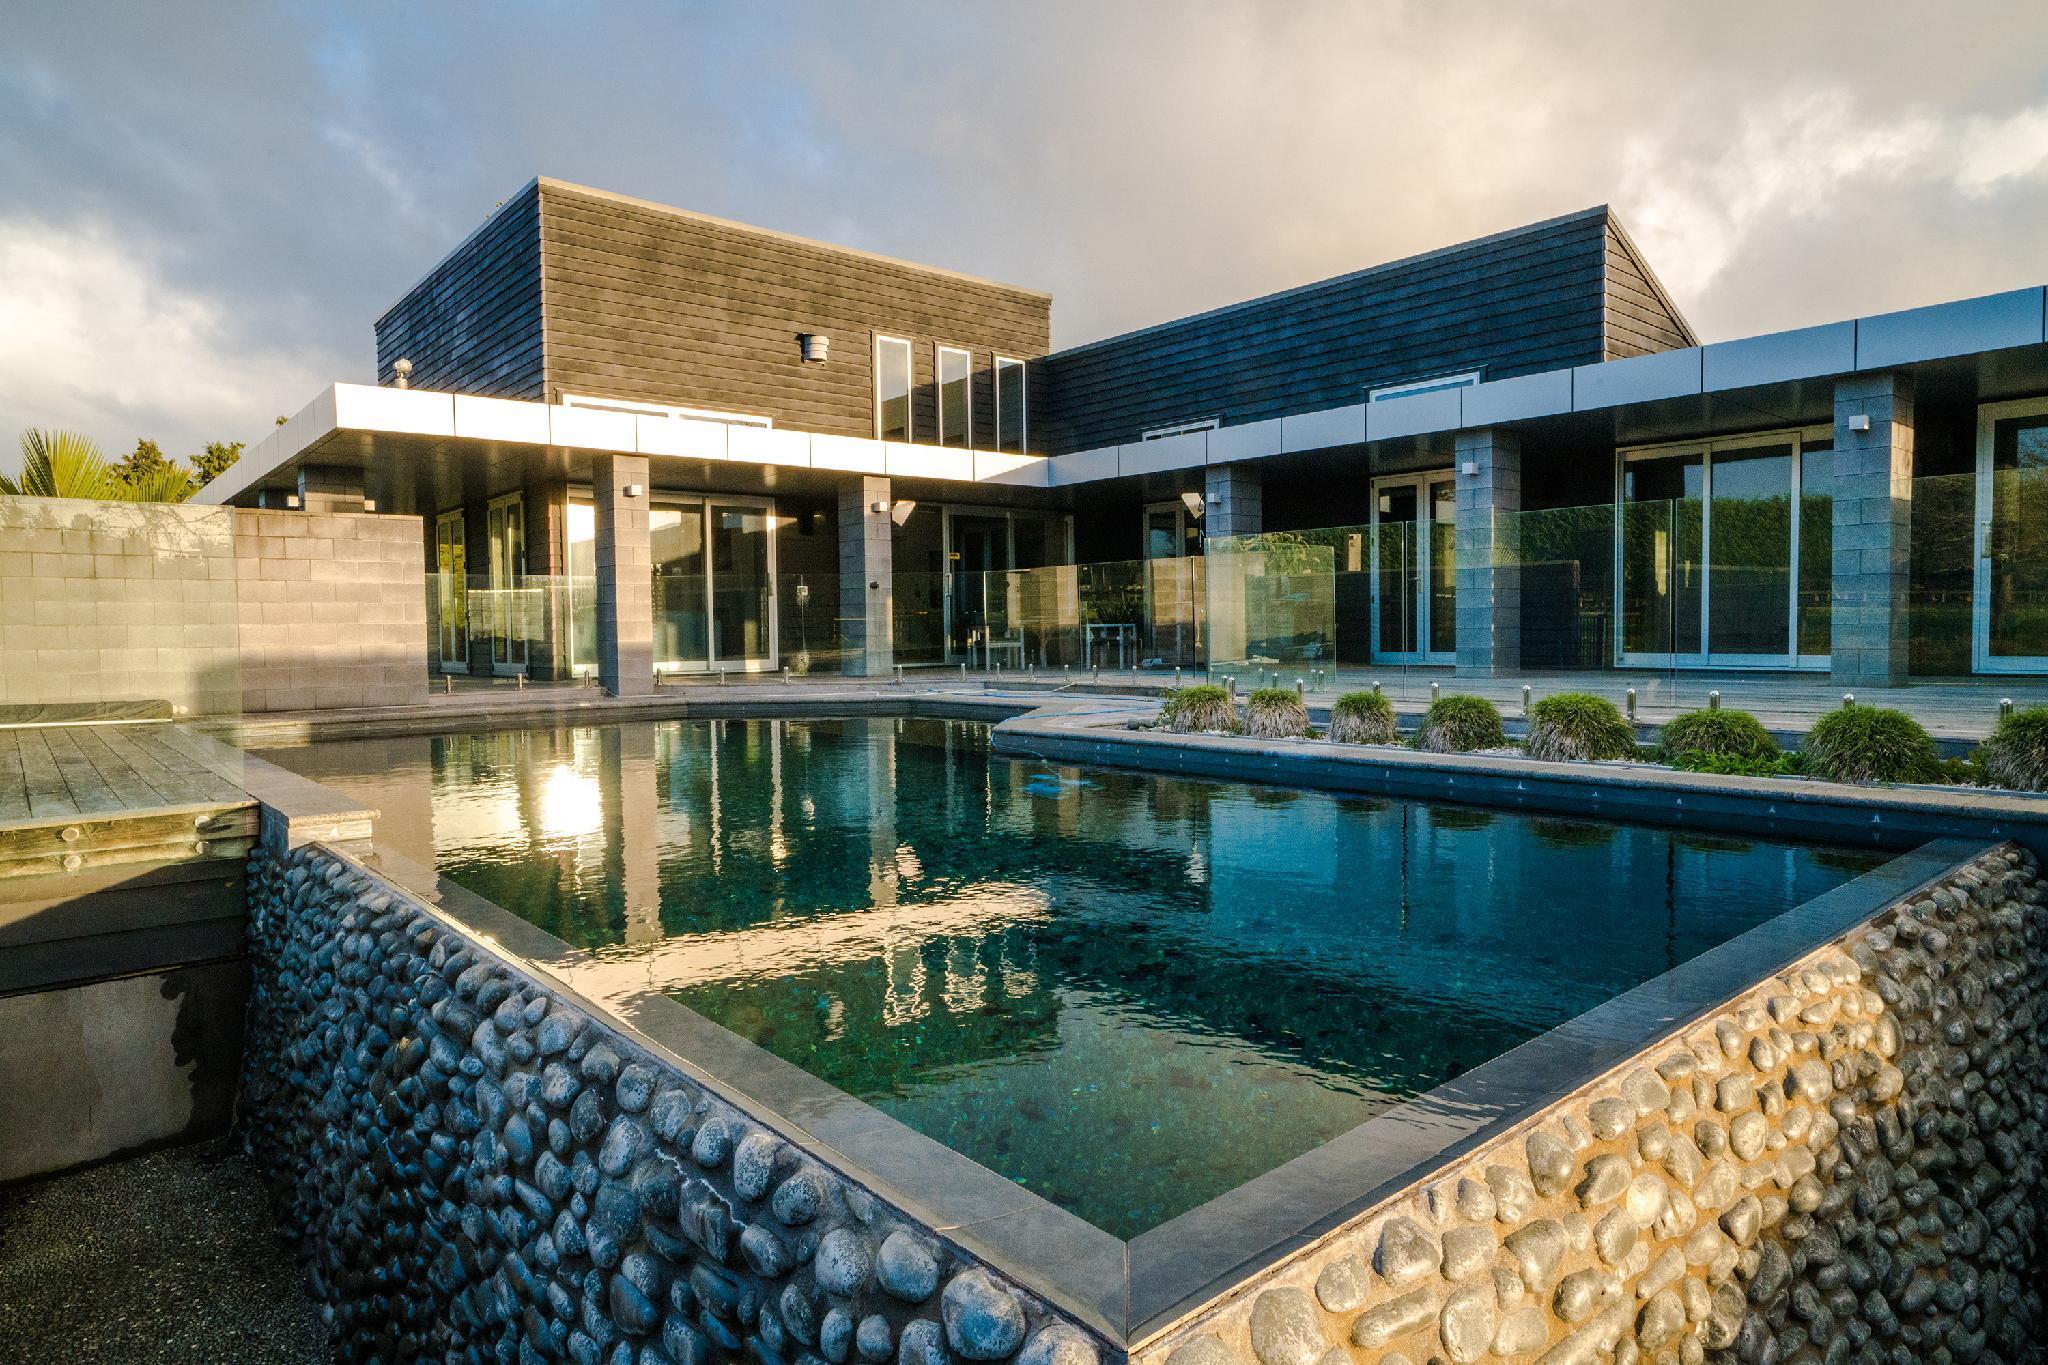 Karaka Lifestyle Premium Vacation Home With Pool